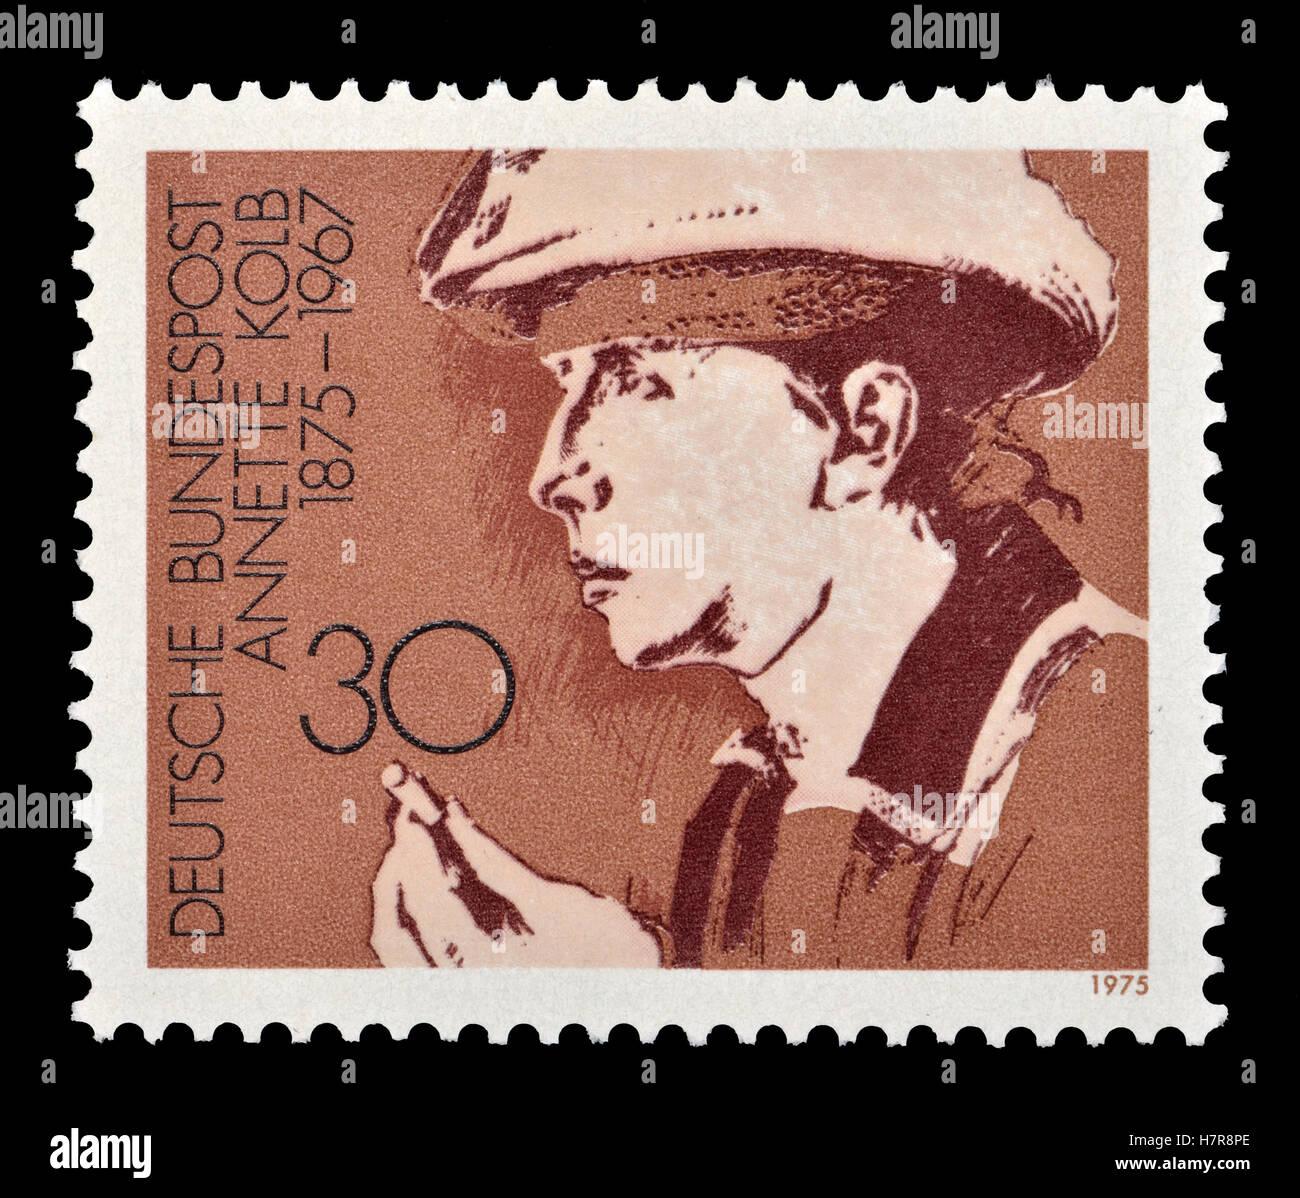 Sello postal alemán (1975) : Annette Kolb / Anna Mathilde Kolb (1875-1967), escritor alemán y pacifista. Imagen De Stock